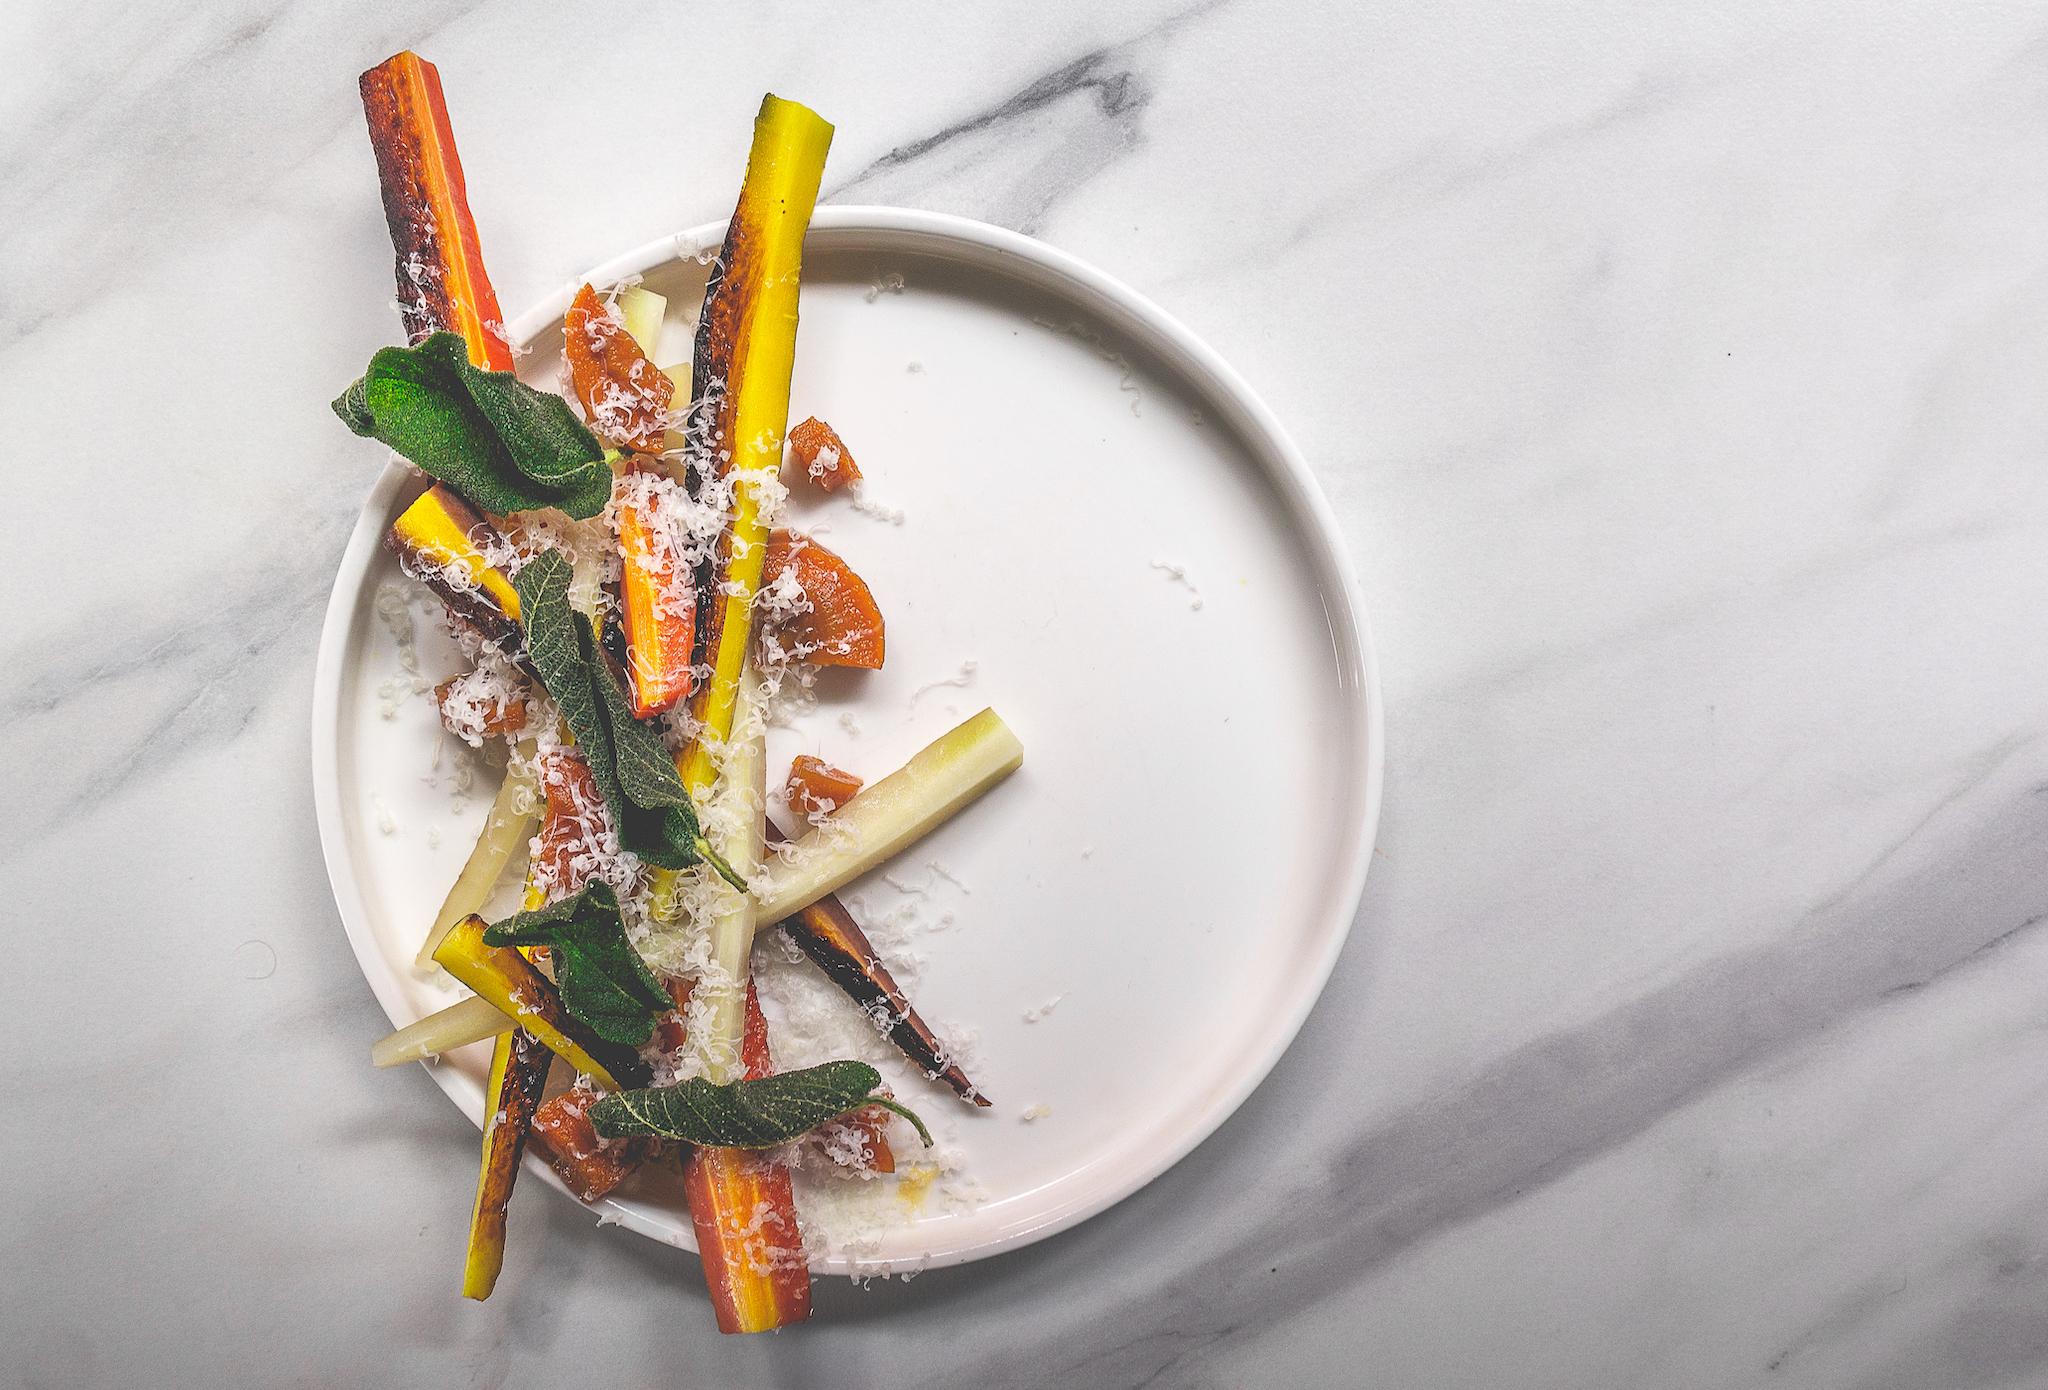 How to make Smoke and Salt's salt-baked carrot recipe